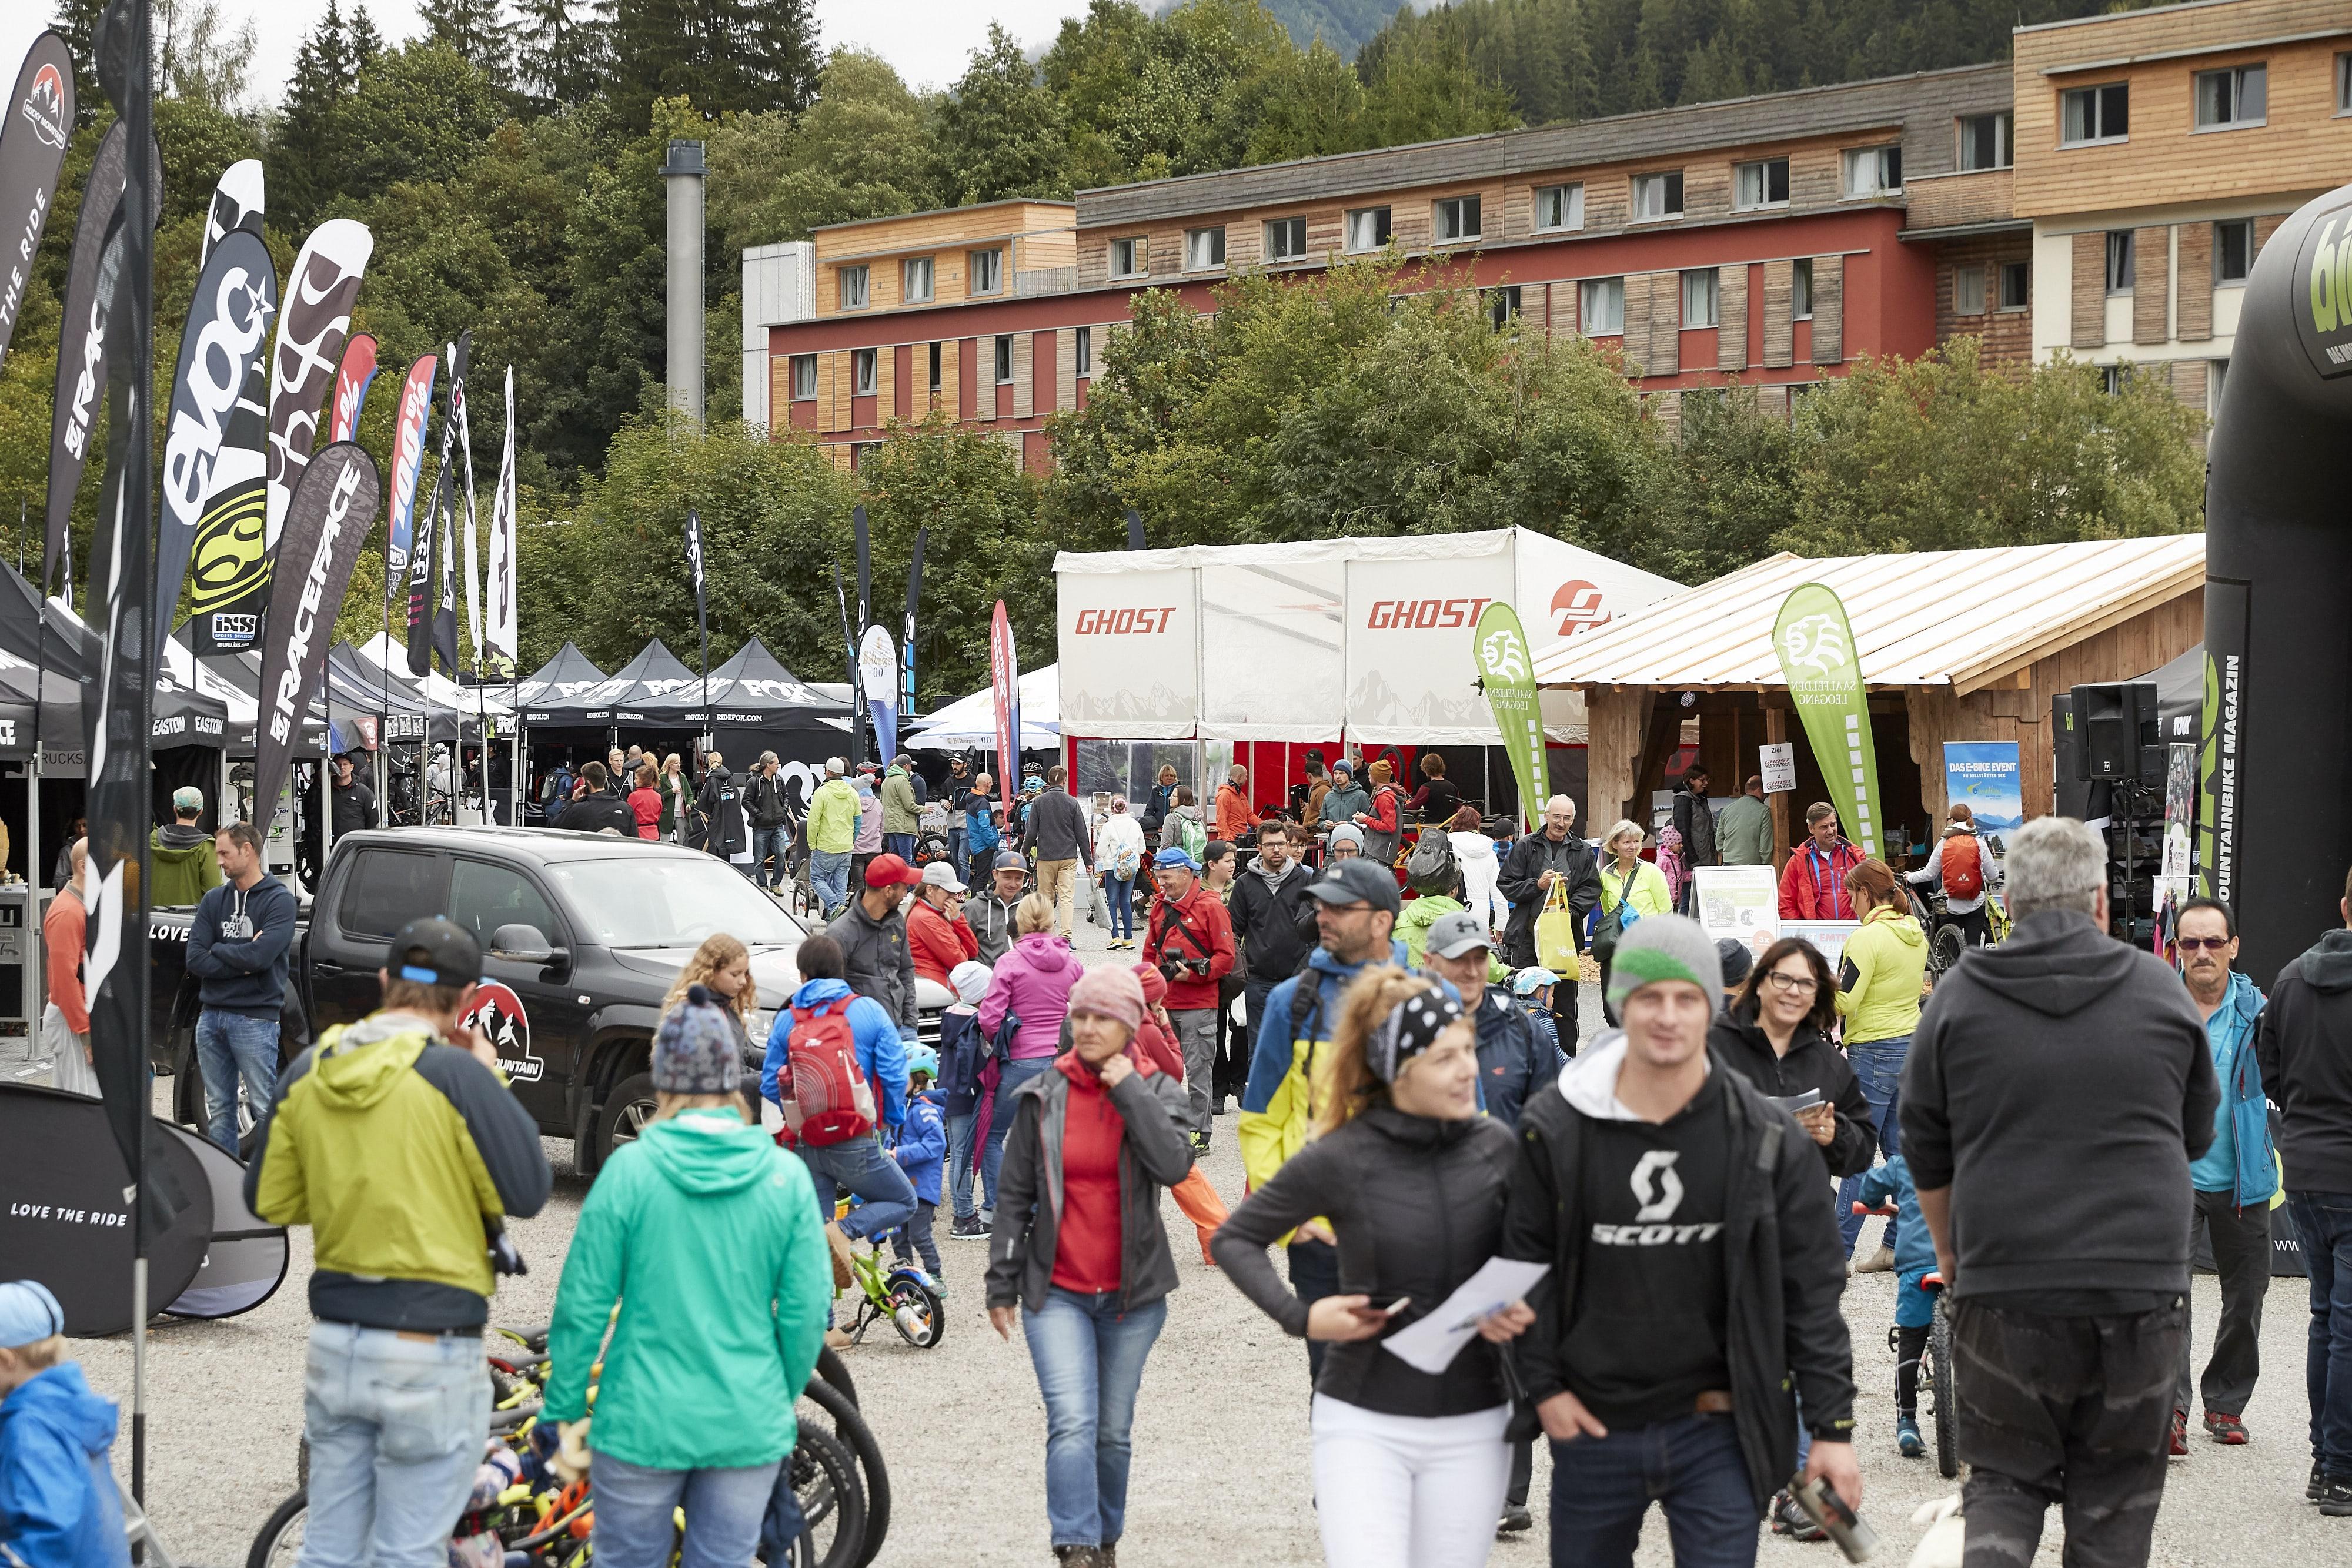 BIKE-Festival-c-Delius-Klasing-Verlag-1